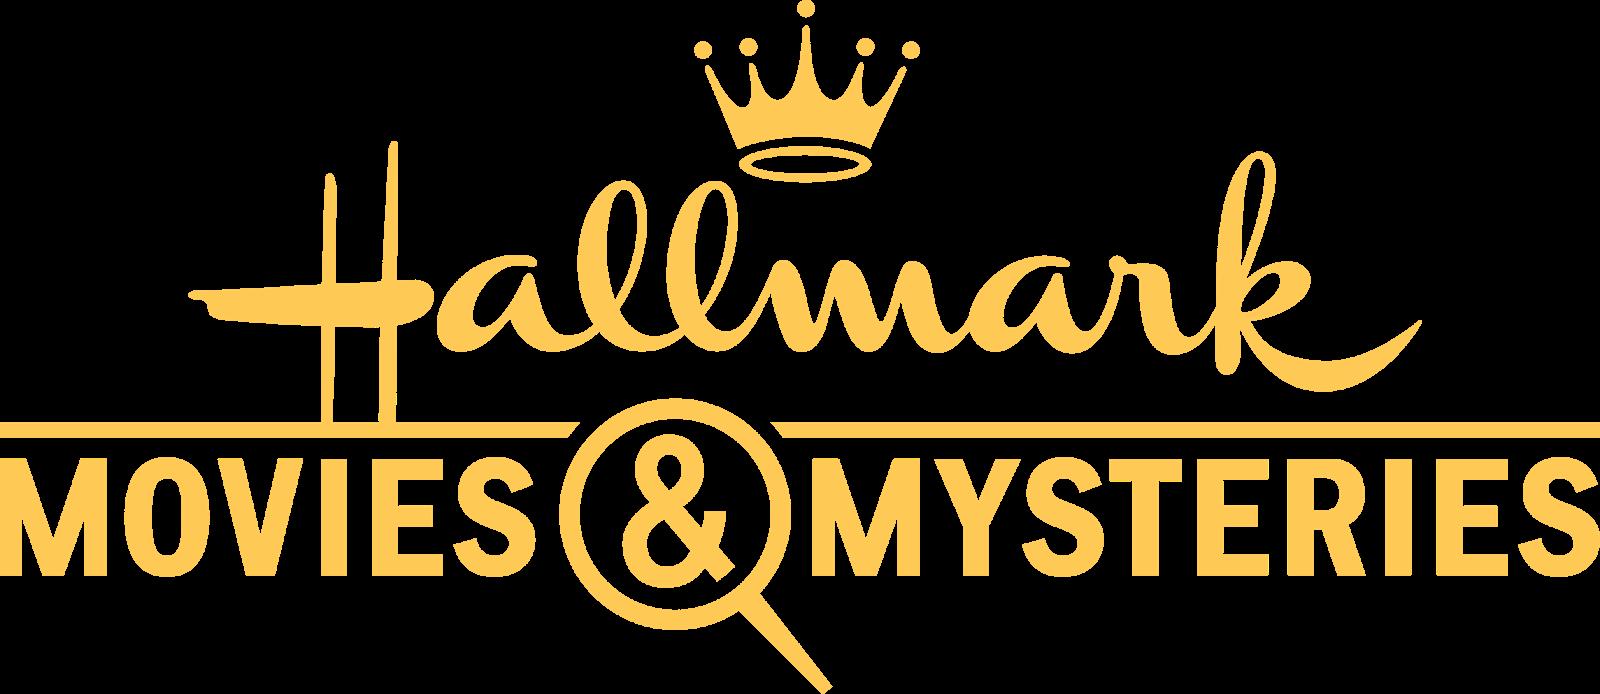 Hallmark Movies And Mysteries.Hallmark Movies Mysteries Ultraverse Wiki Fandom Powered By Wikia